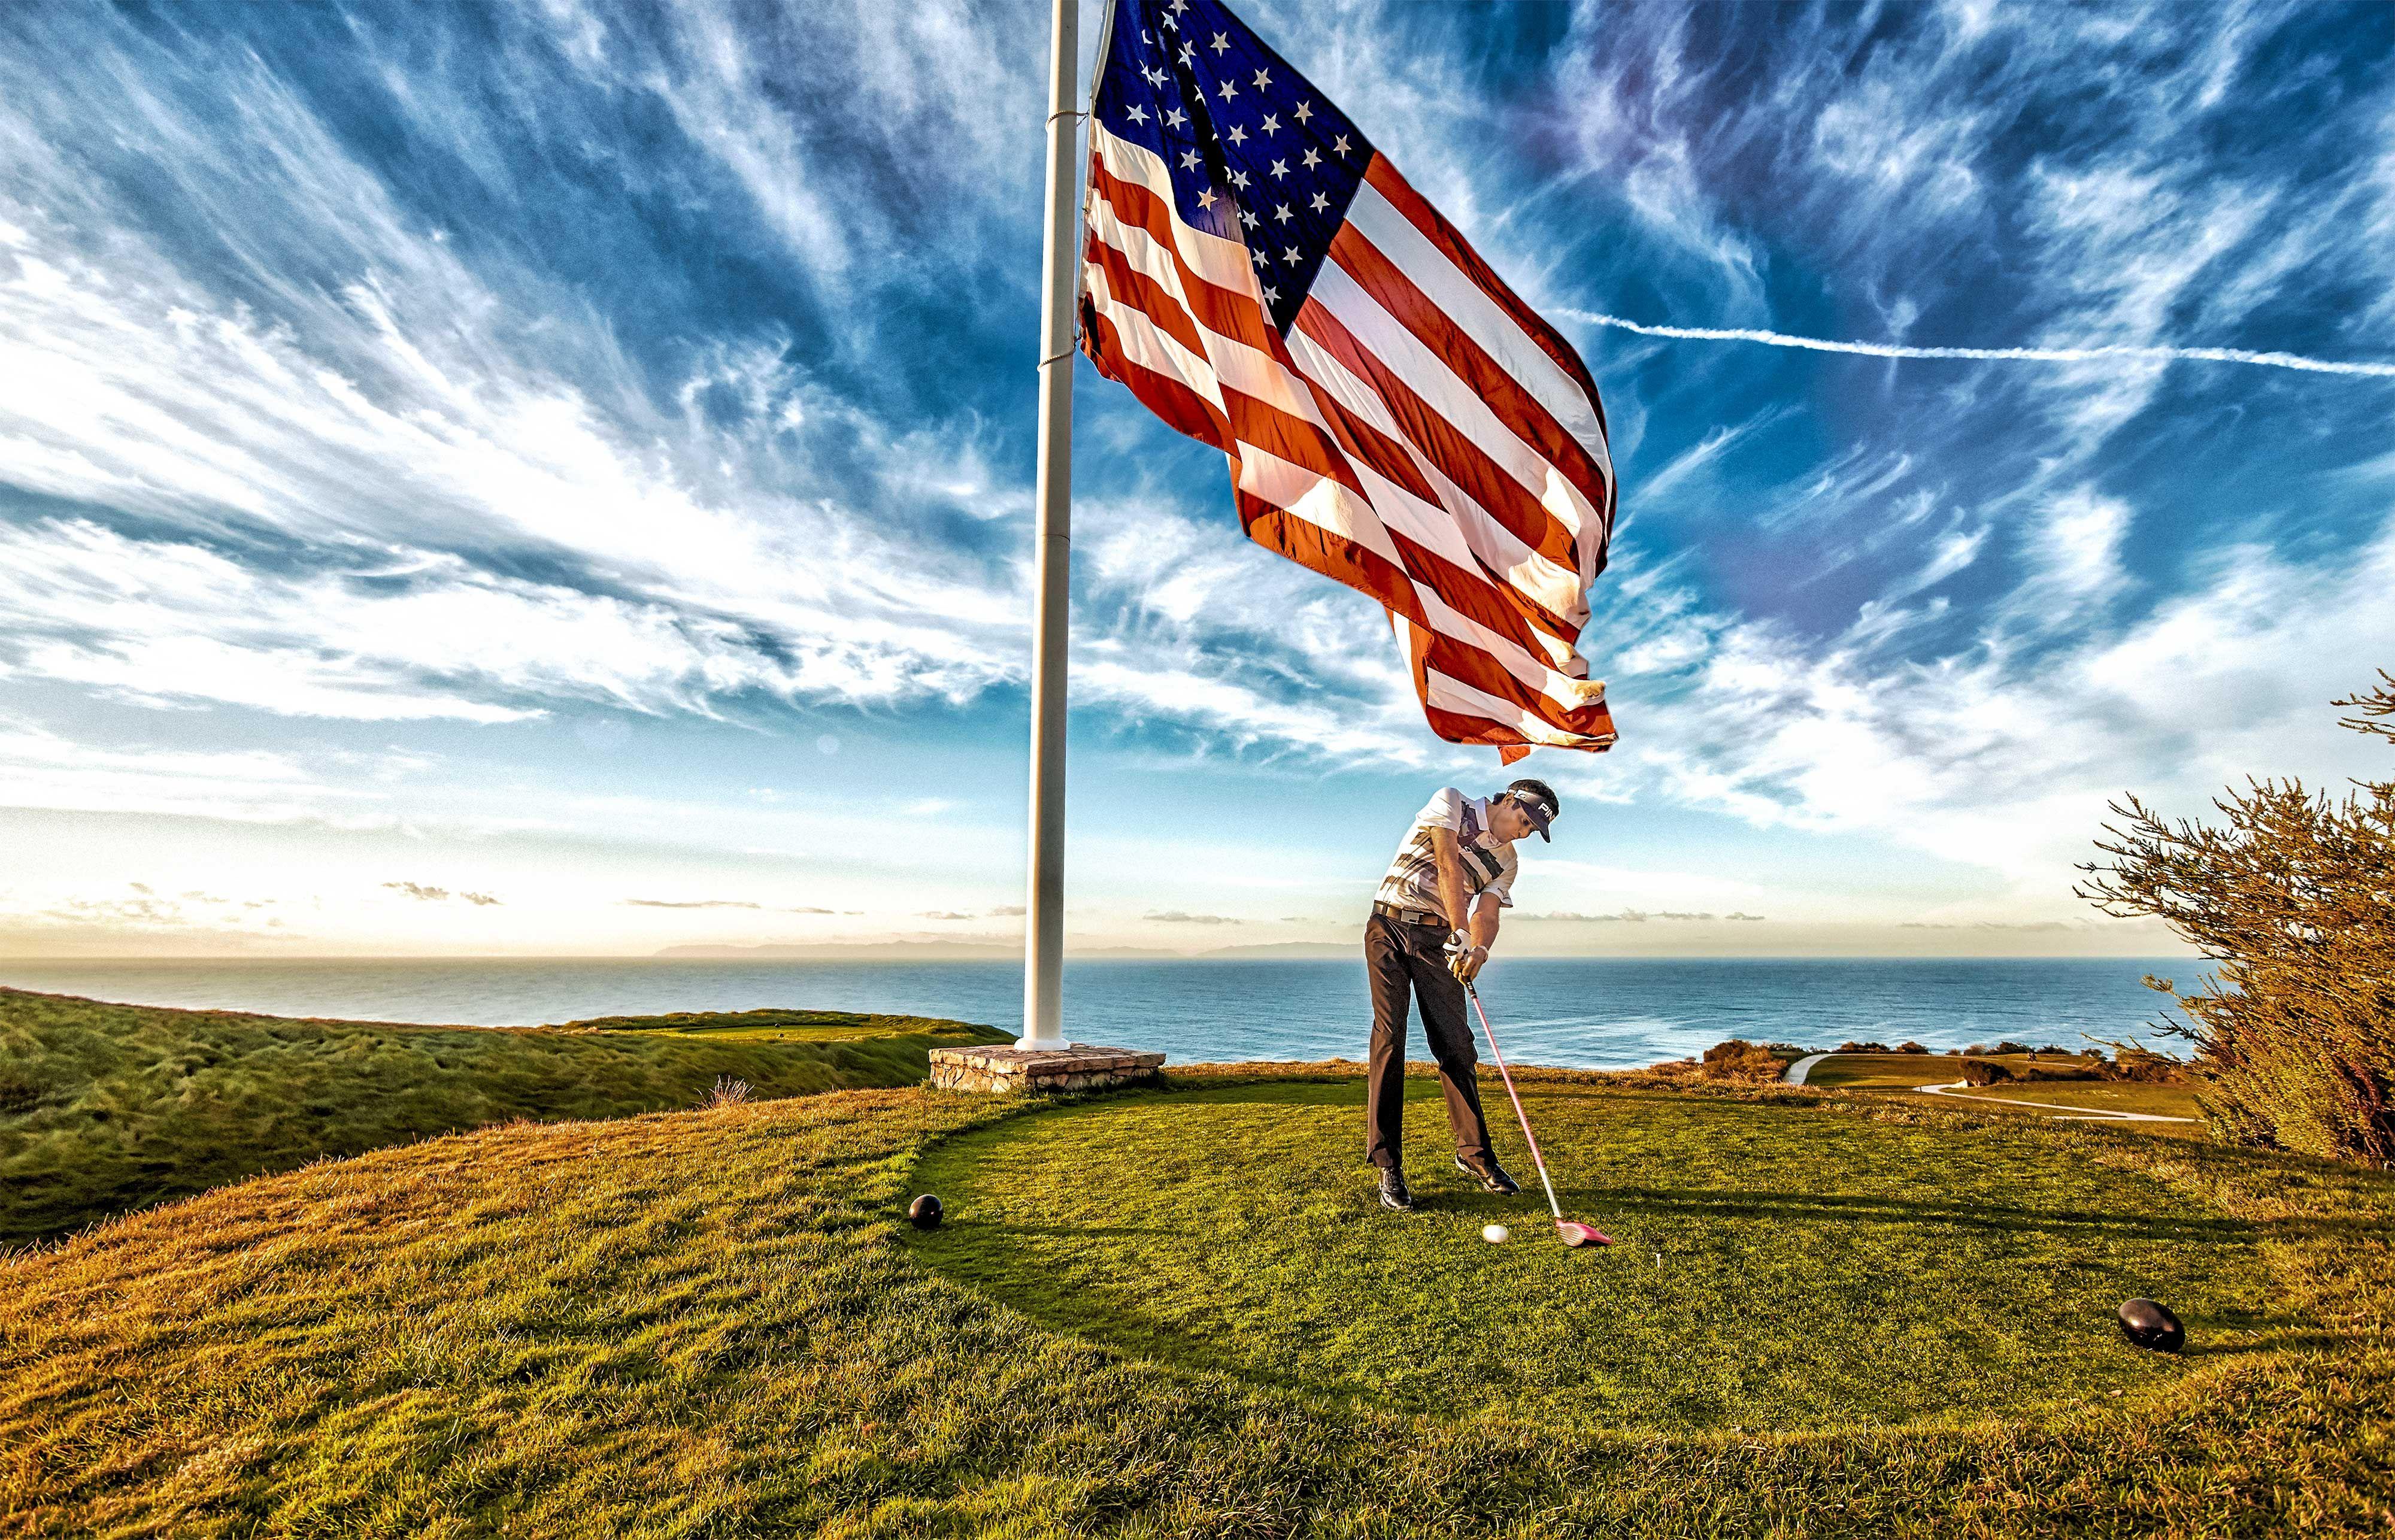 BubbaWatson_Flag_McEniry_2019.jpg